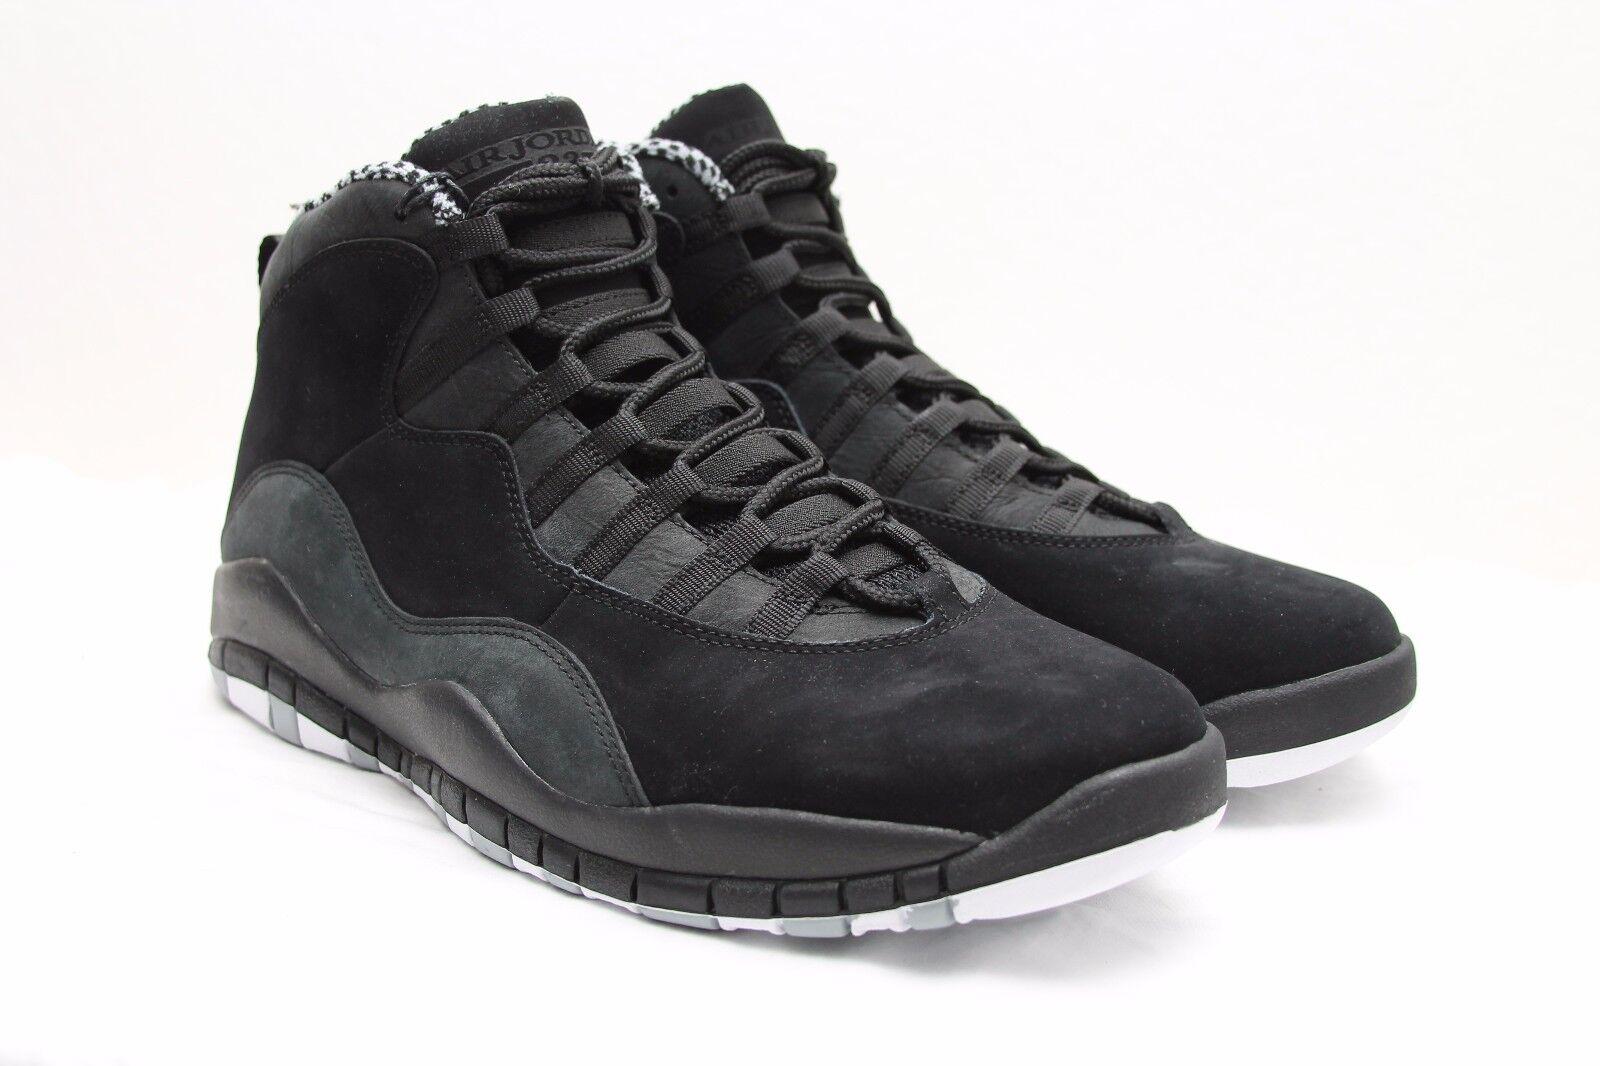 big sale 9cc73 cb895 DS 2012 Air Jordan 10 Retro X size 11 Black Black Black White Stealth xi iii